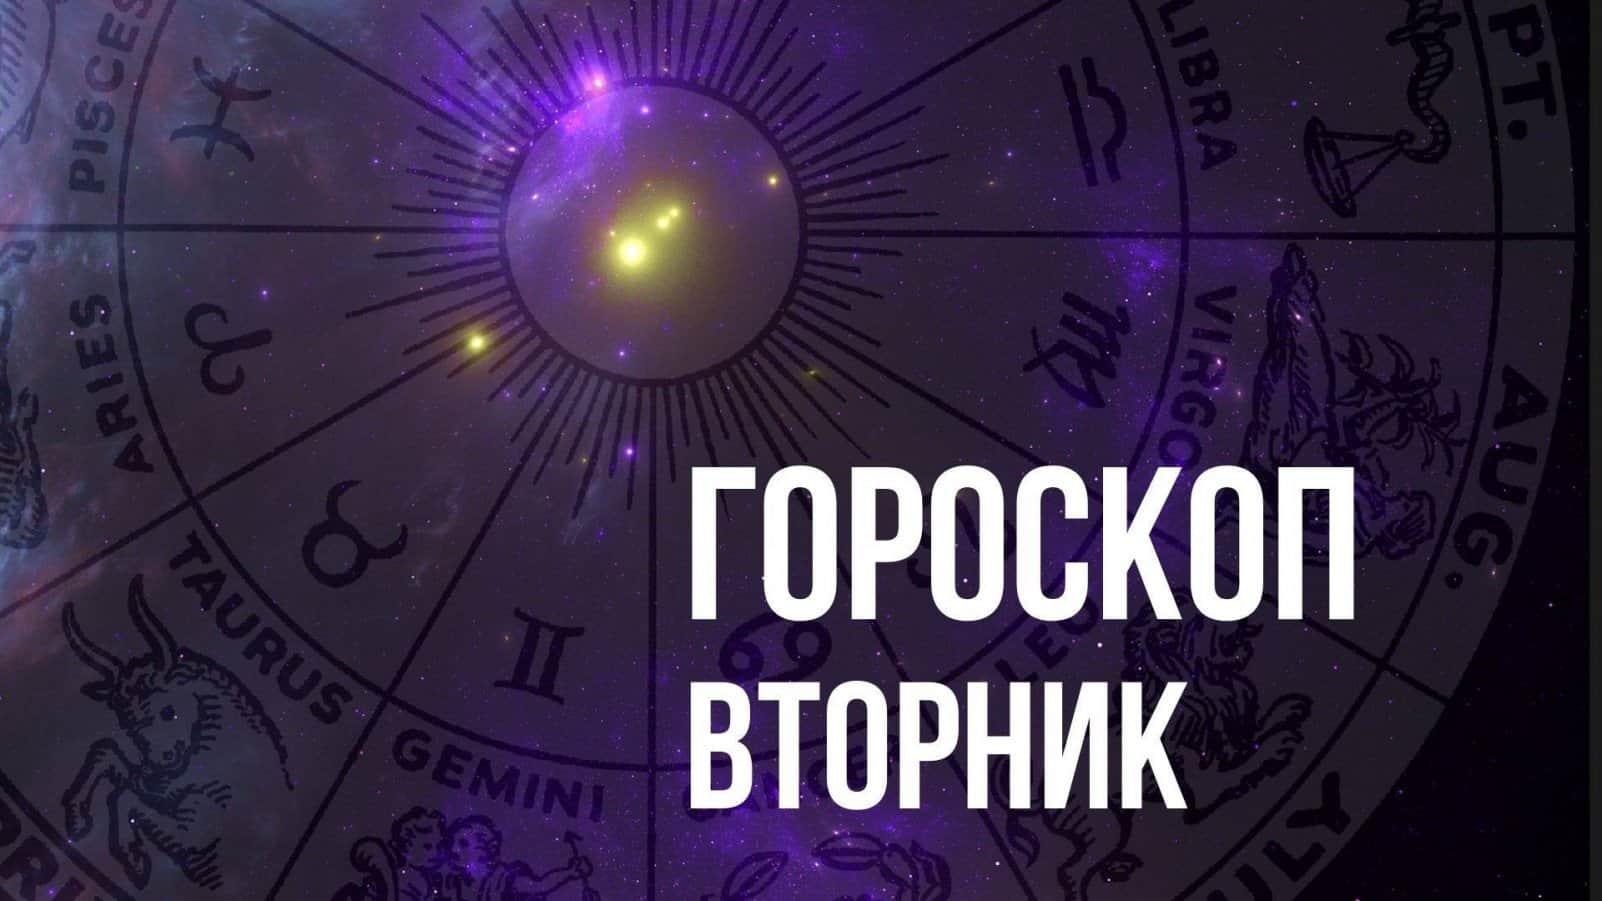 Гороскоп на вторник 23 марта для каждого знака Зодиака